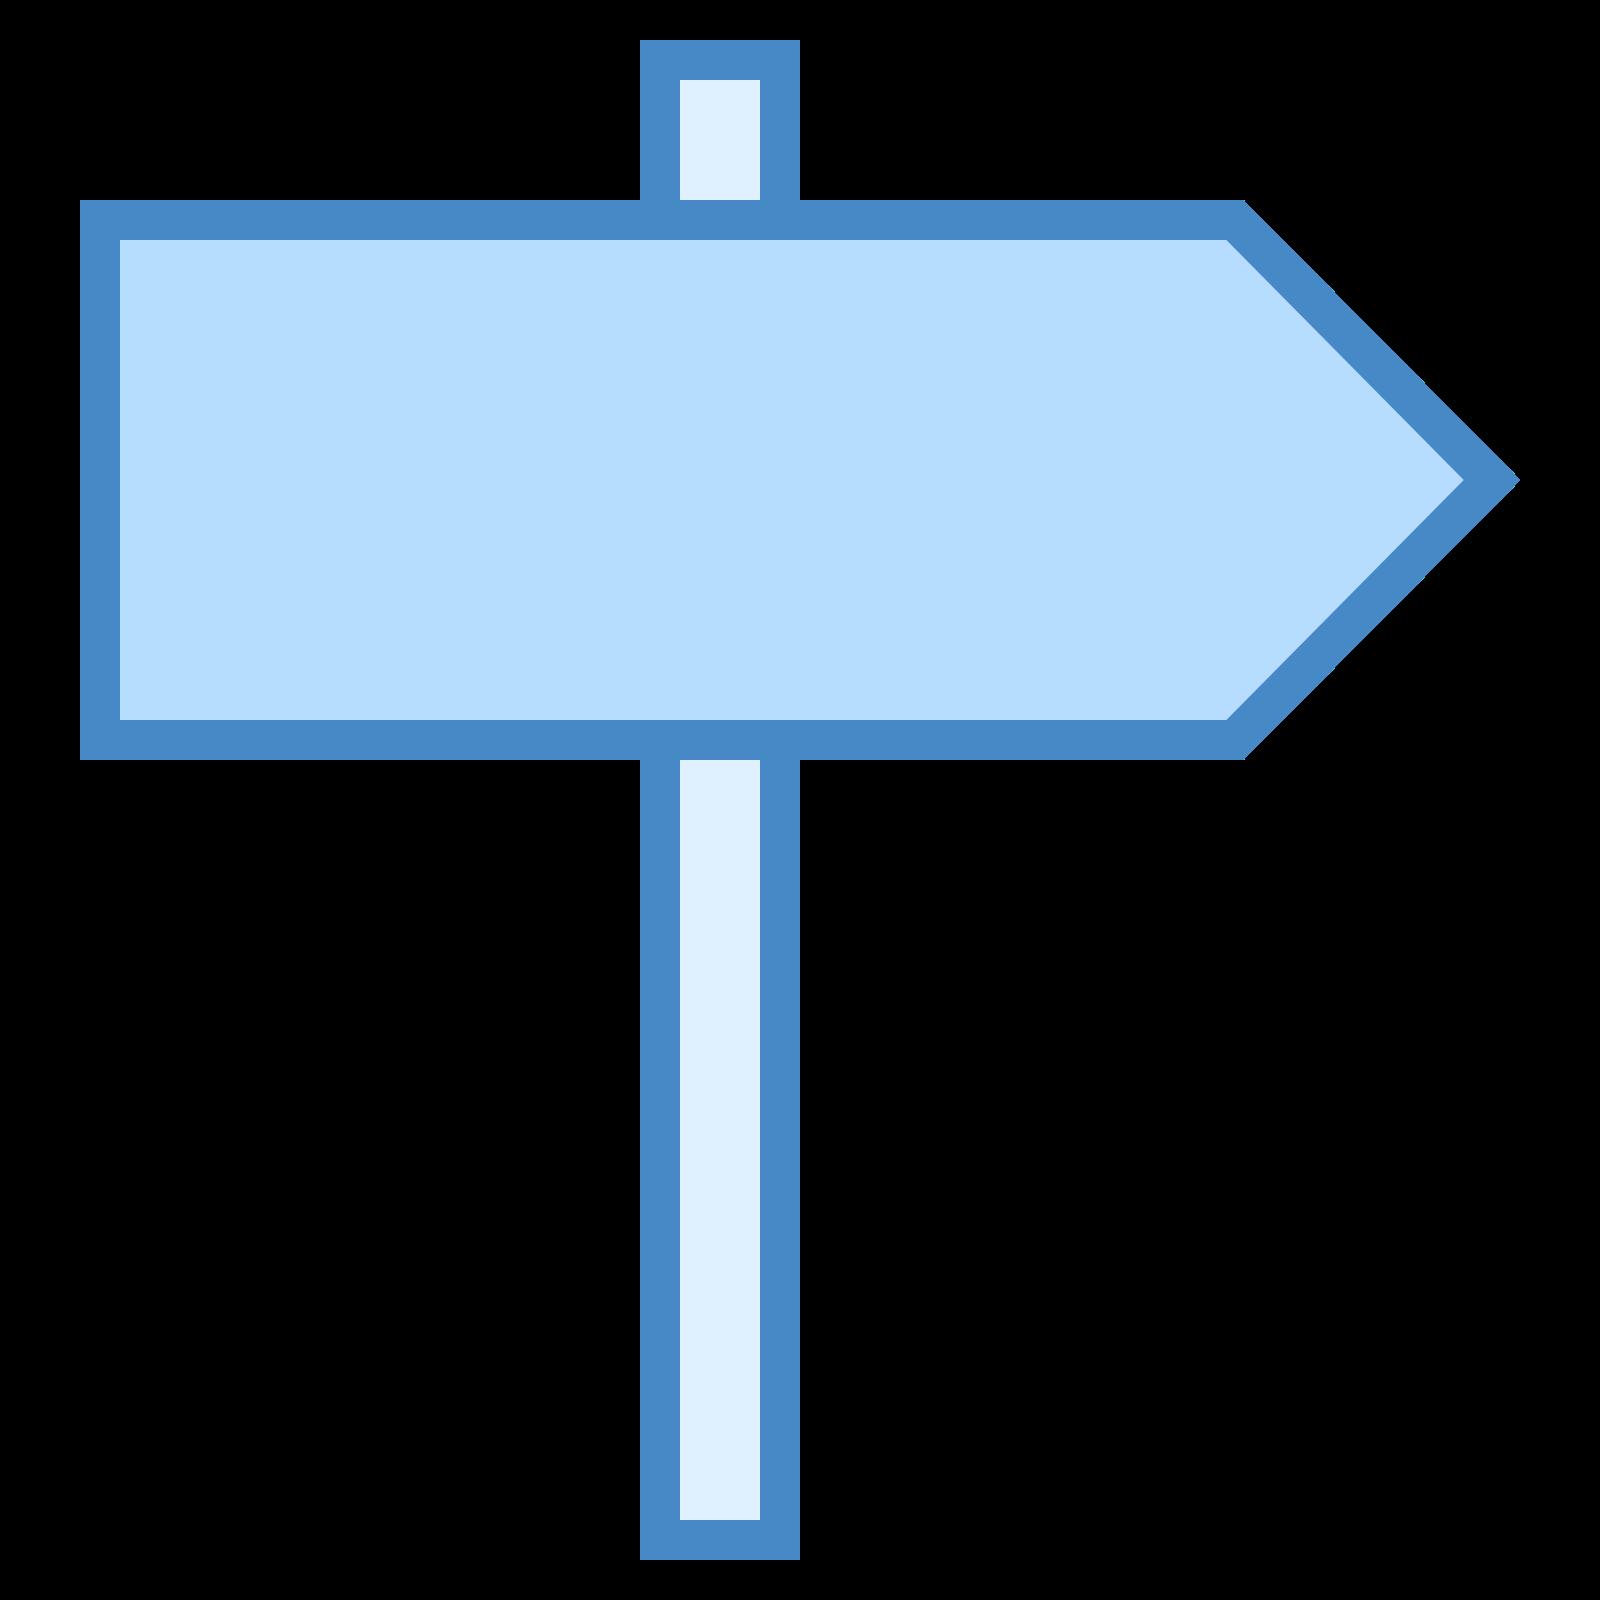 Signpost icon